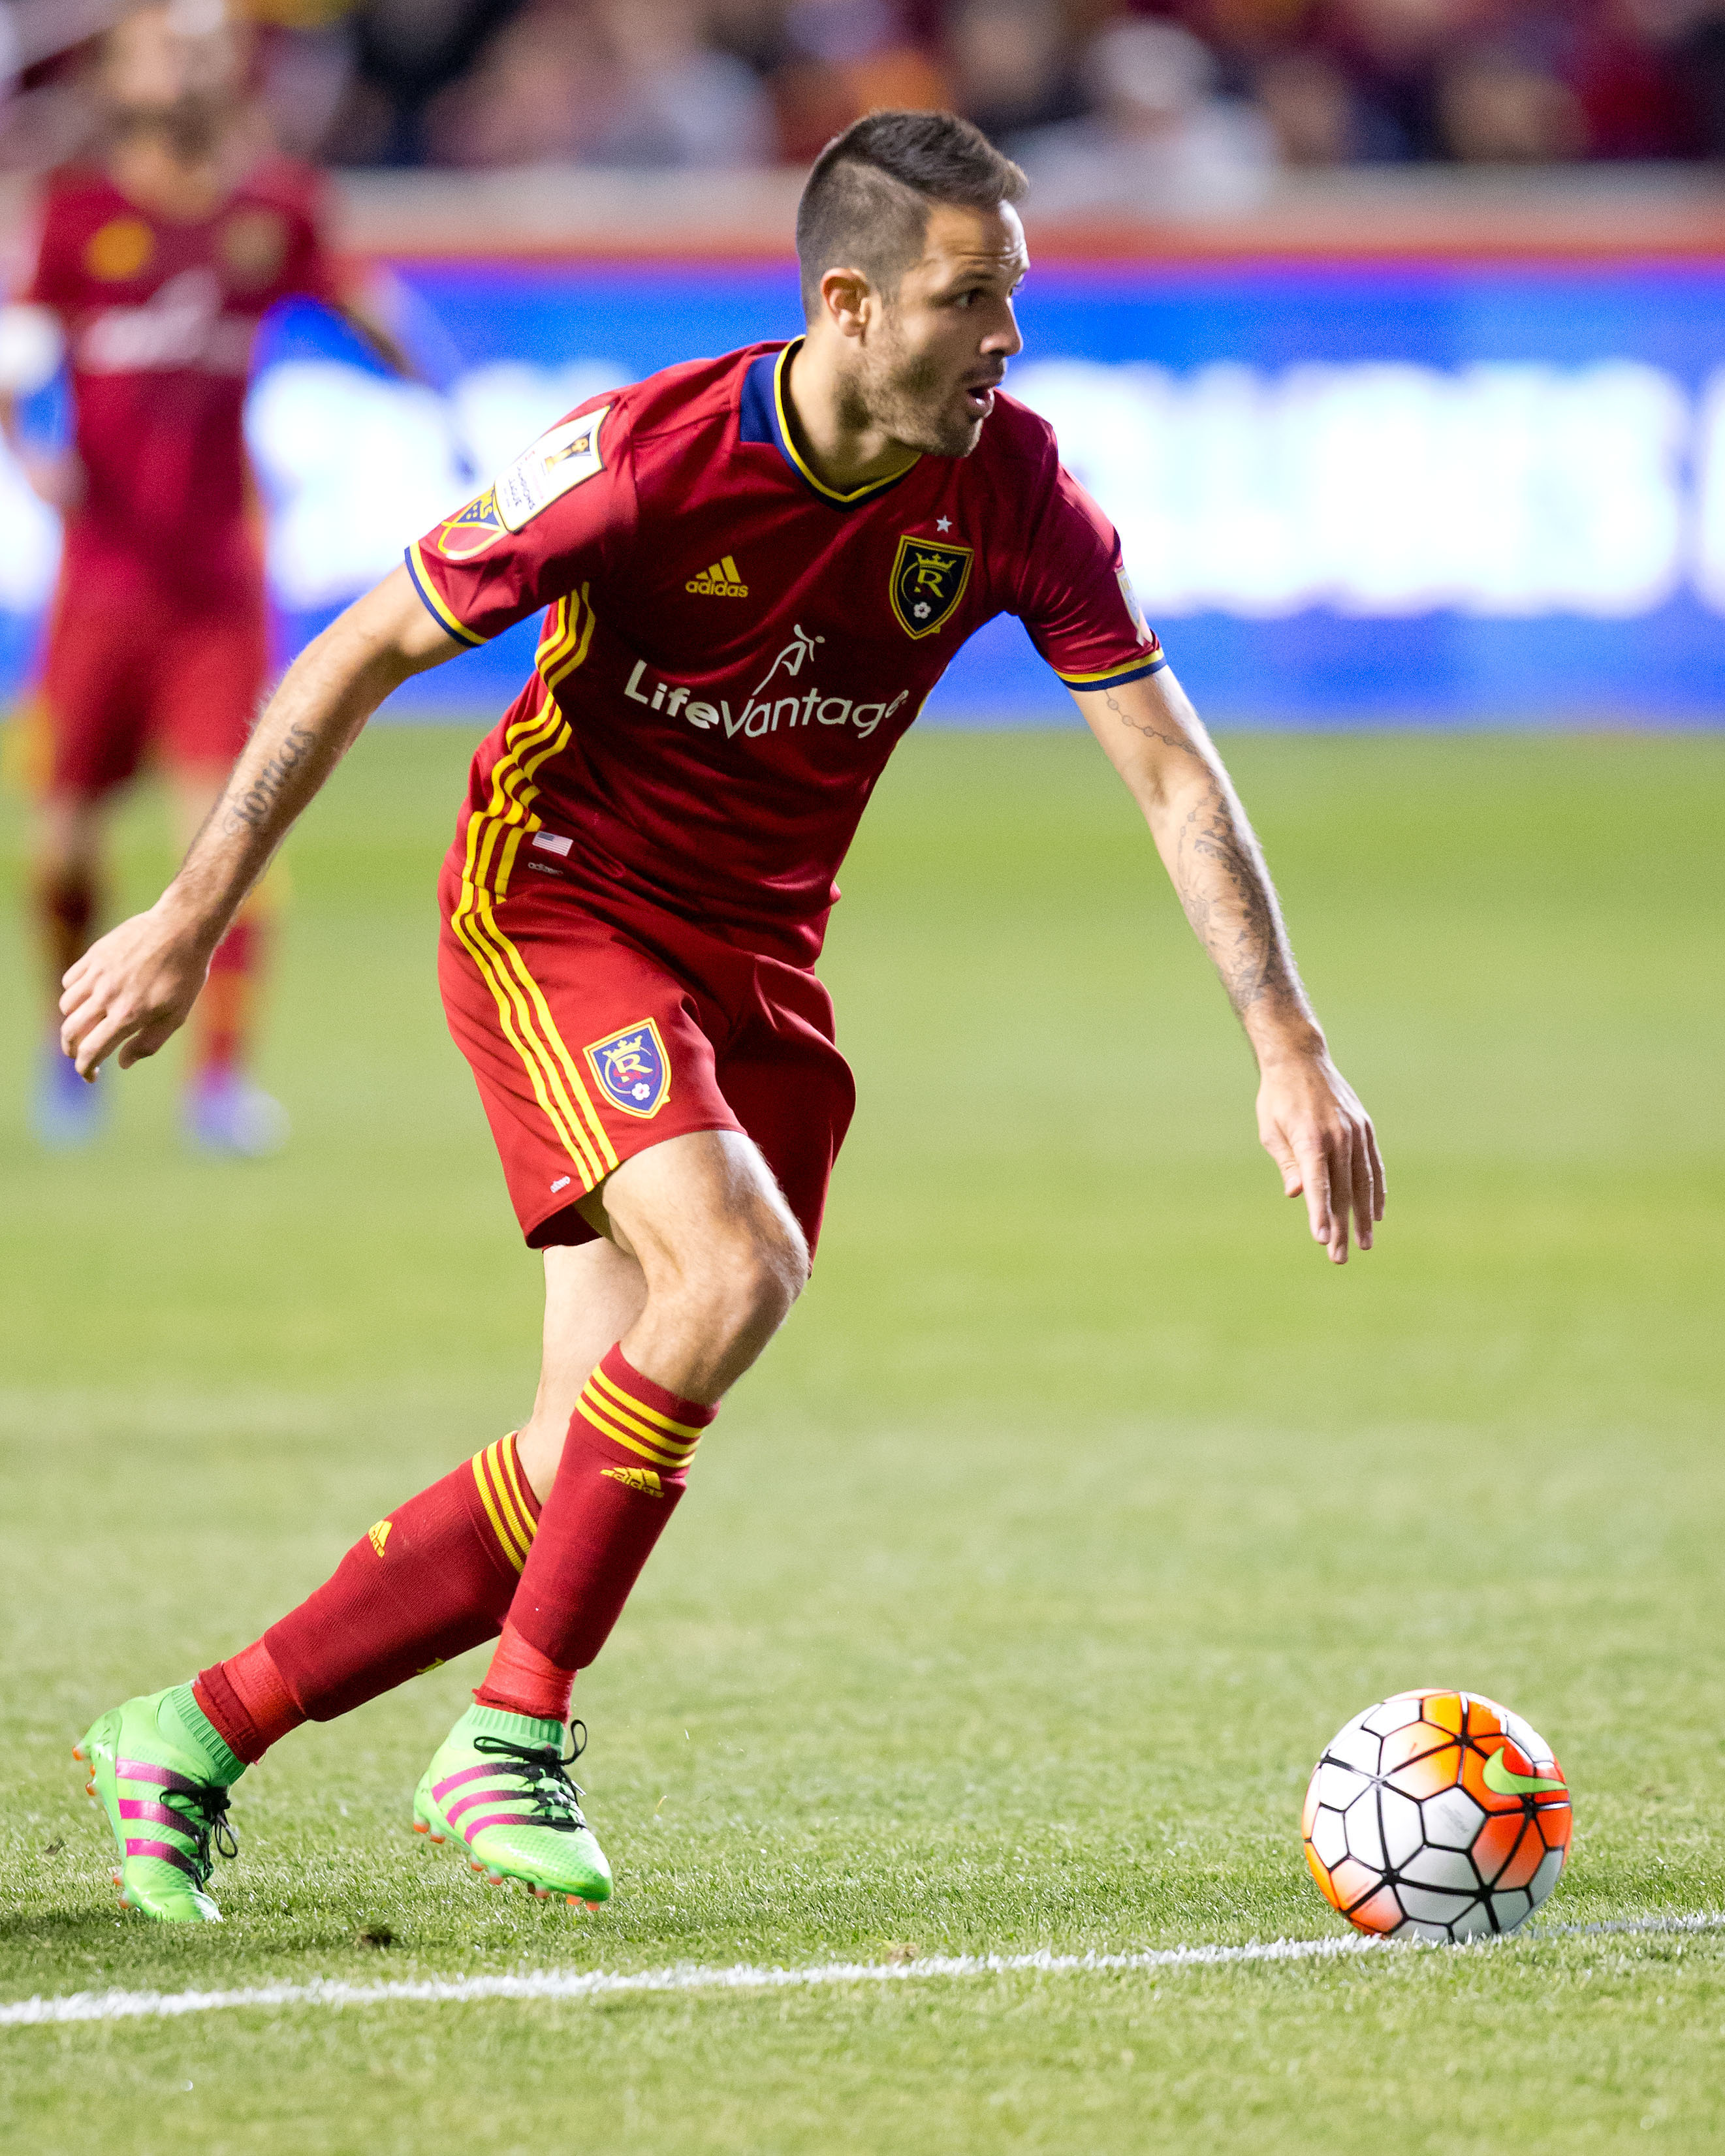 MLS: CONCACAF Champions League-Tigres UANL at Real Salt Lake